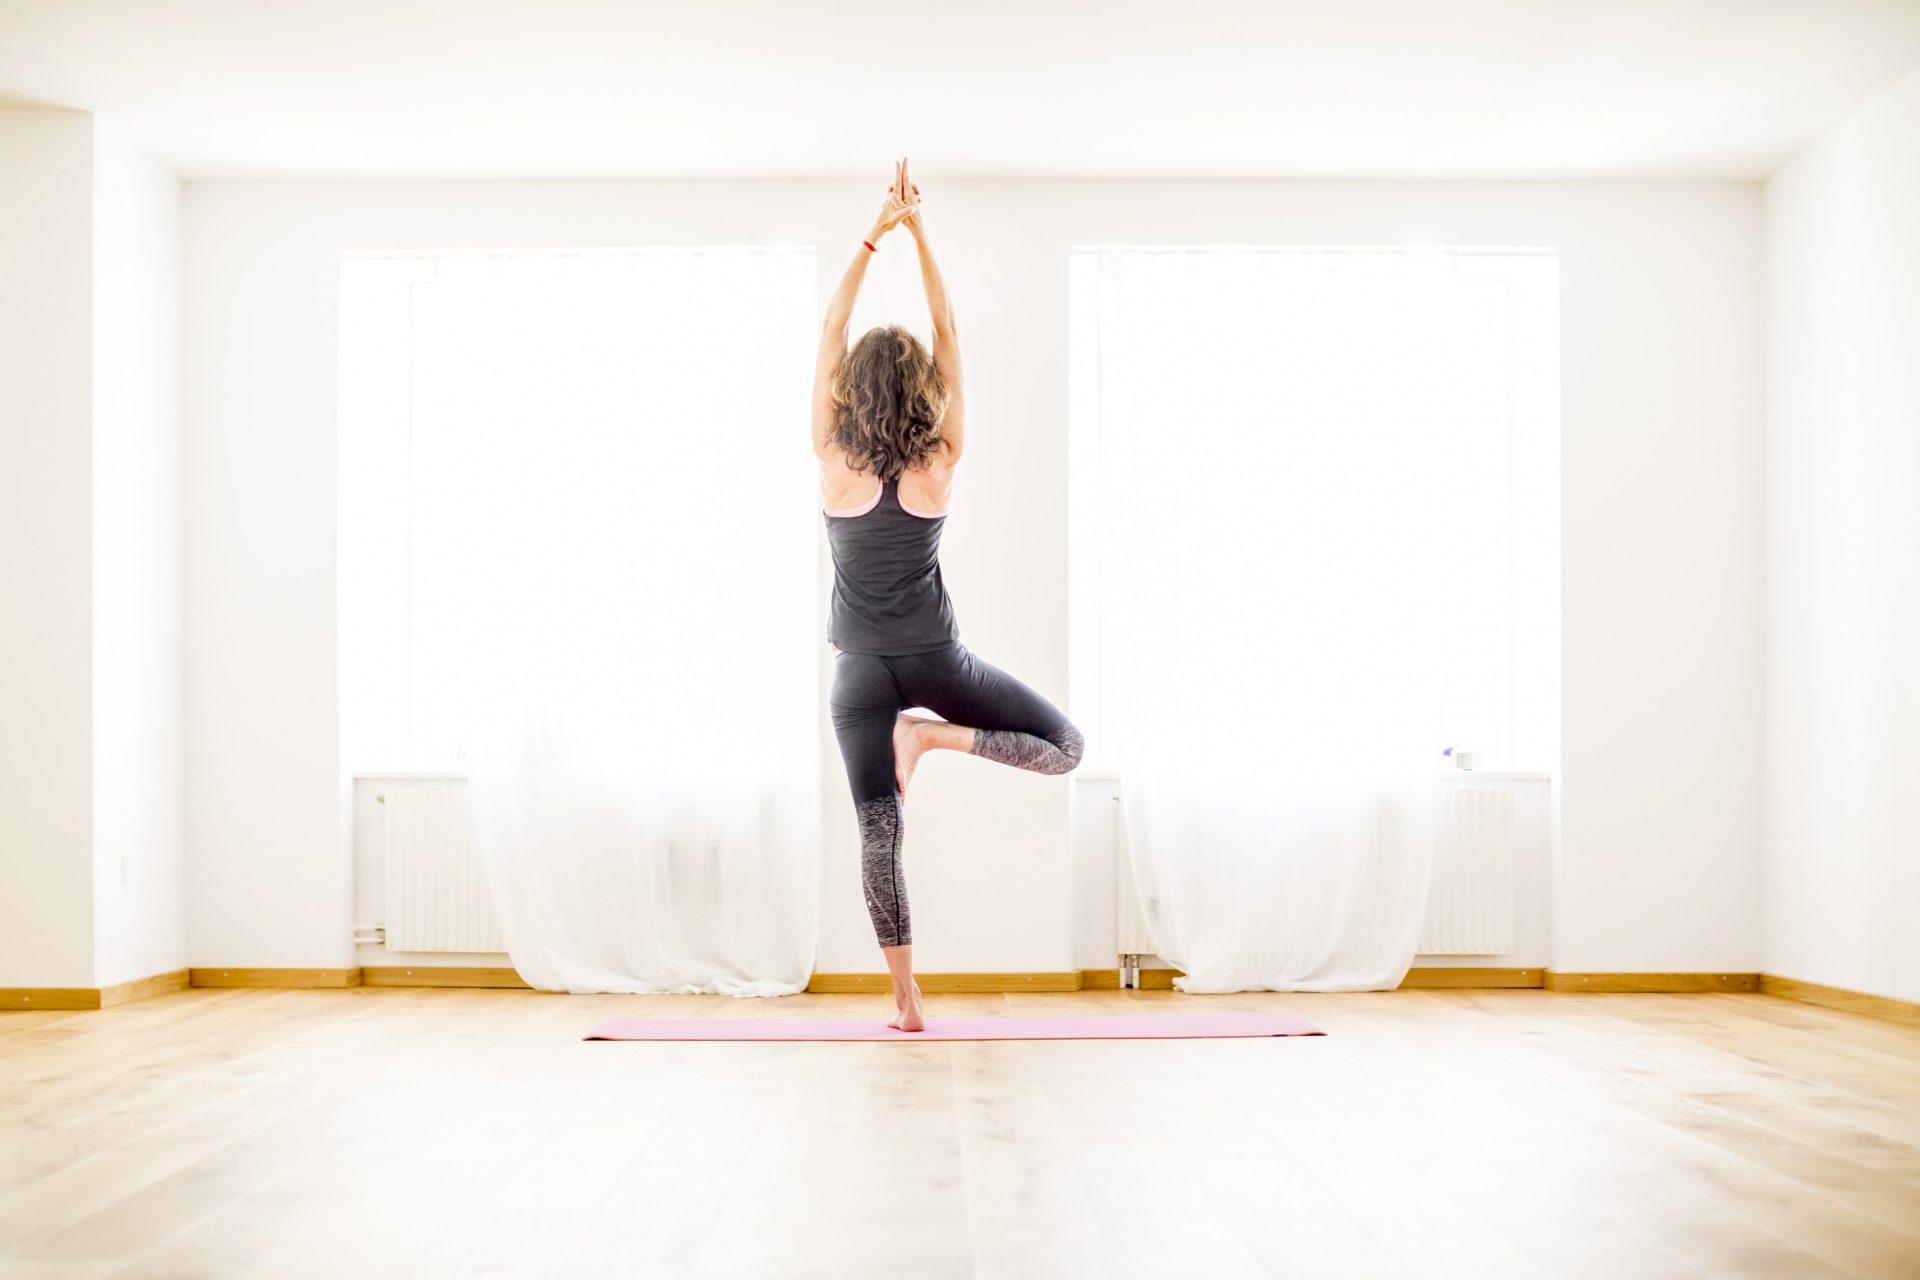 yoga-chur-reichsgasse-raum-fenster-lang5